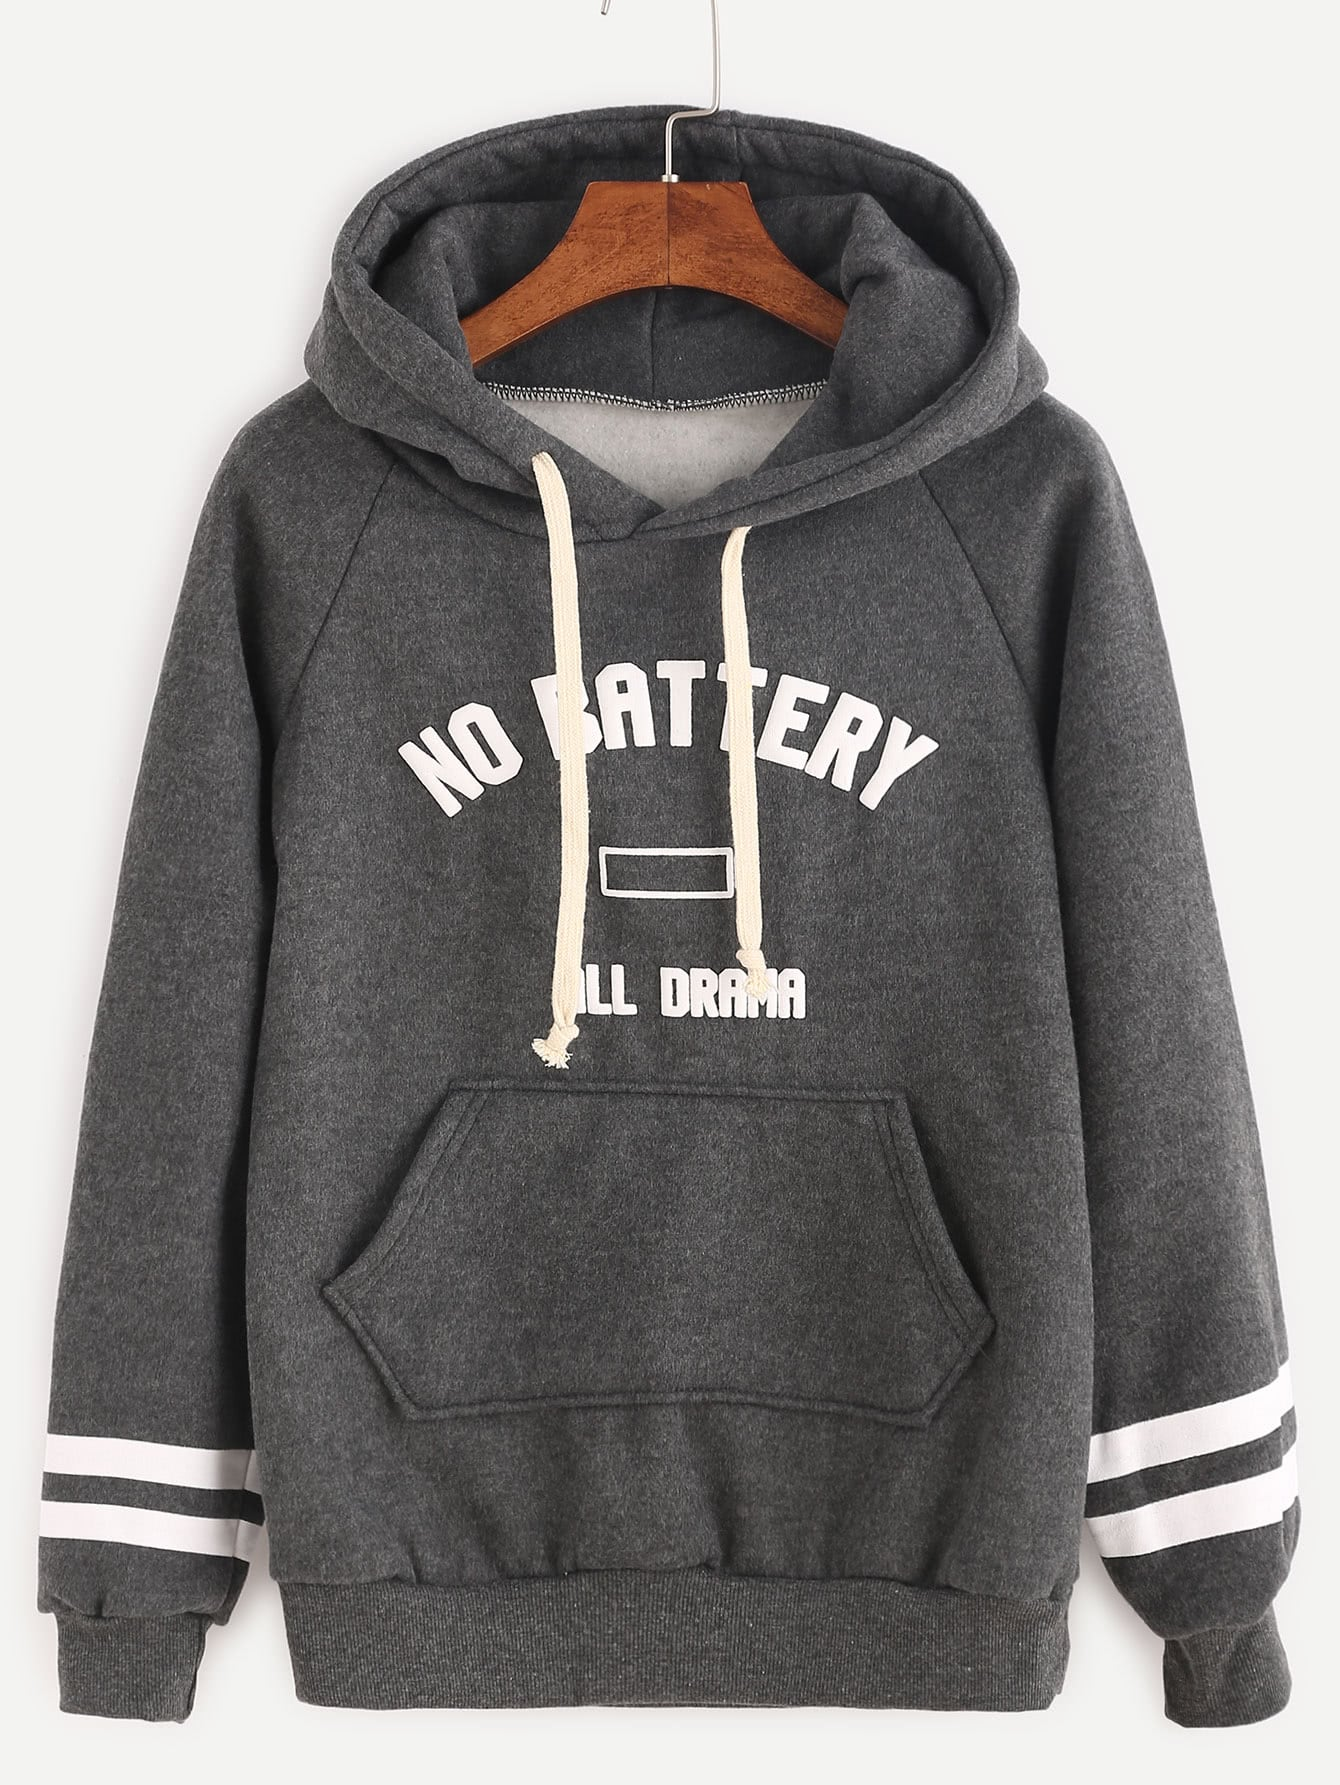 Dark Grey Varsity Print Raglan Sleeve Sweatshirt two tone raglan sleeve sweatshirt